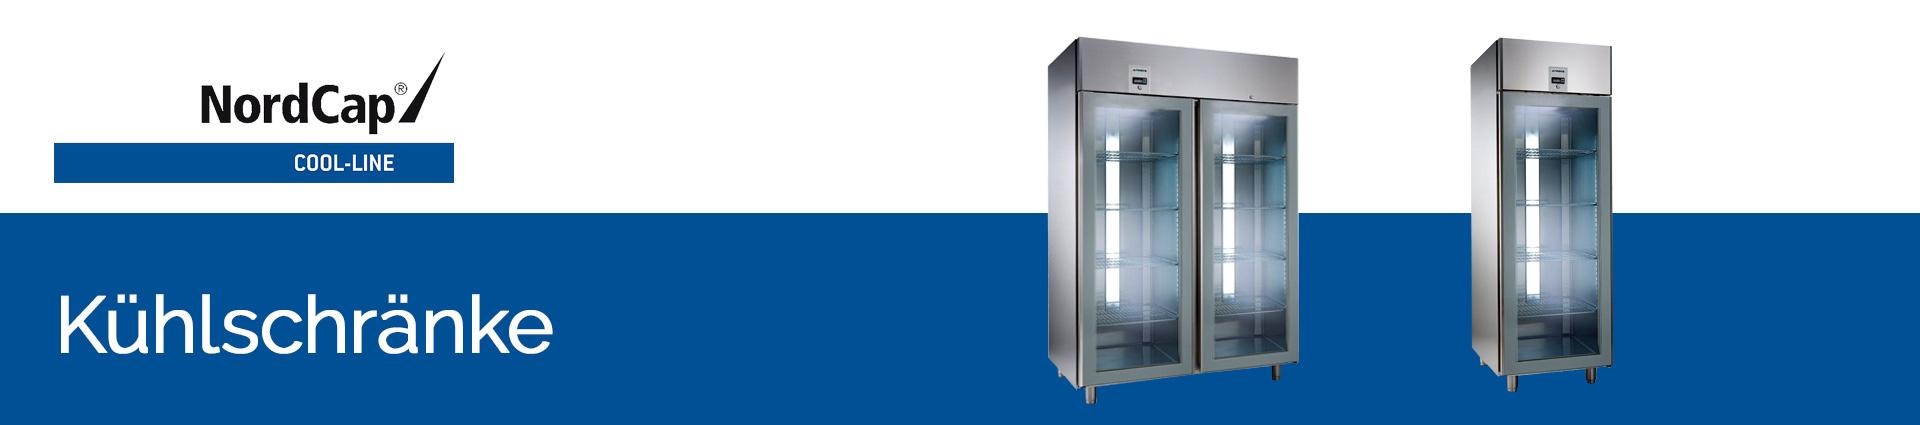 NordCap Cool-Line Kühlschränke Banner